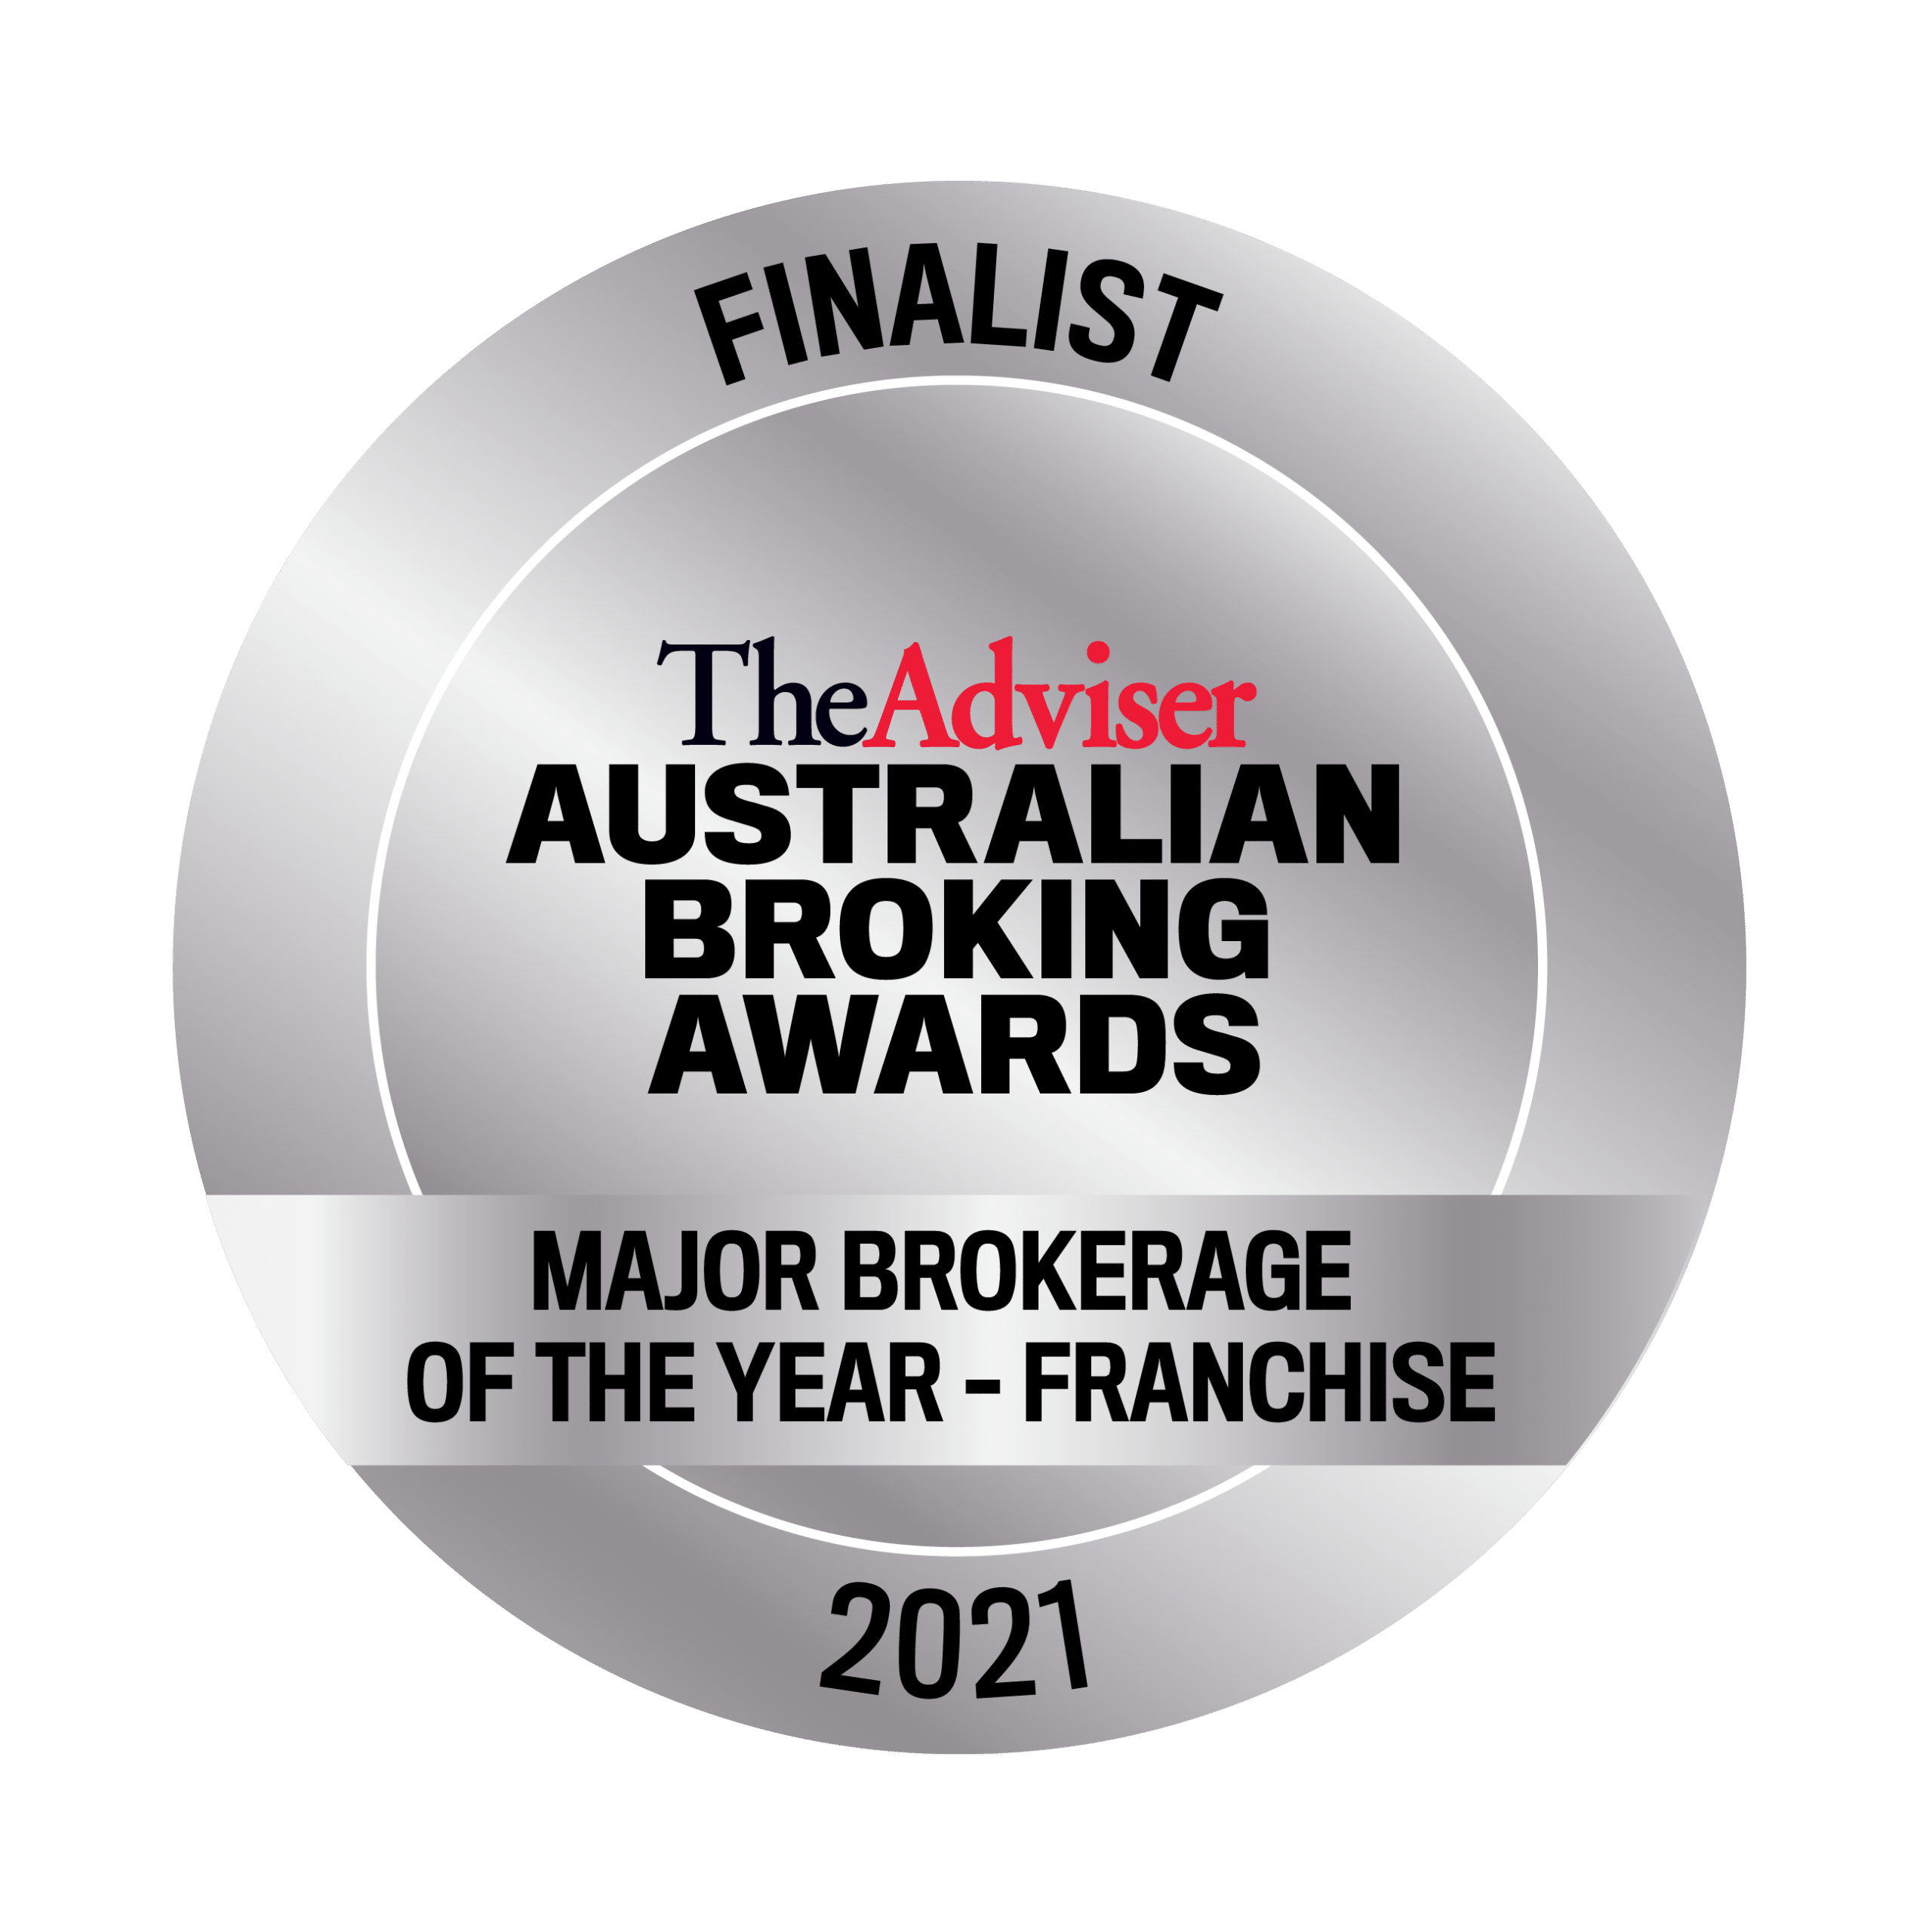 Awarded as Top 25 Brokerage 2021